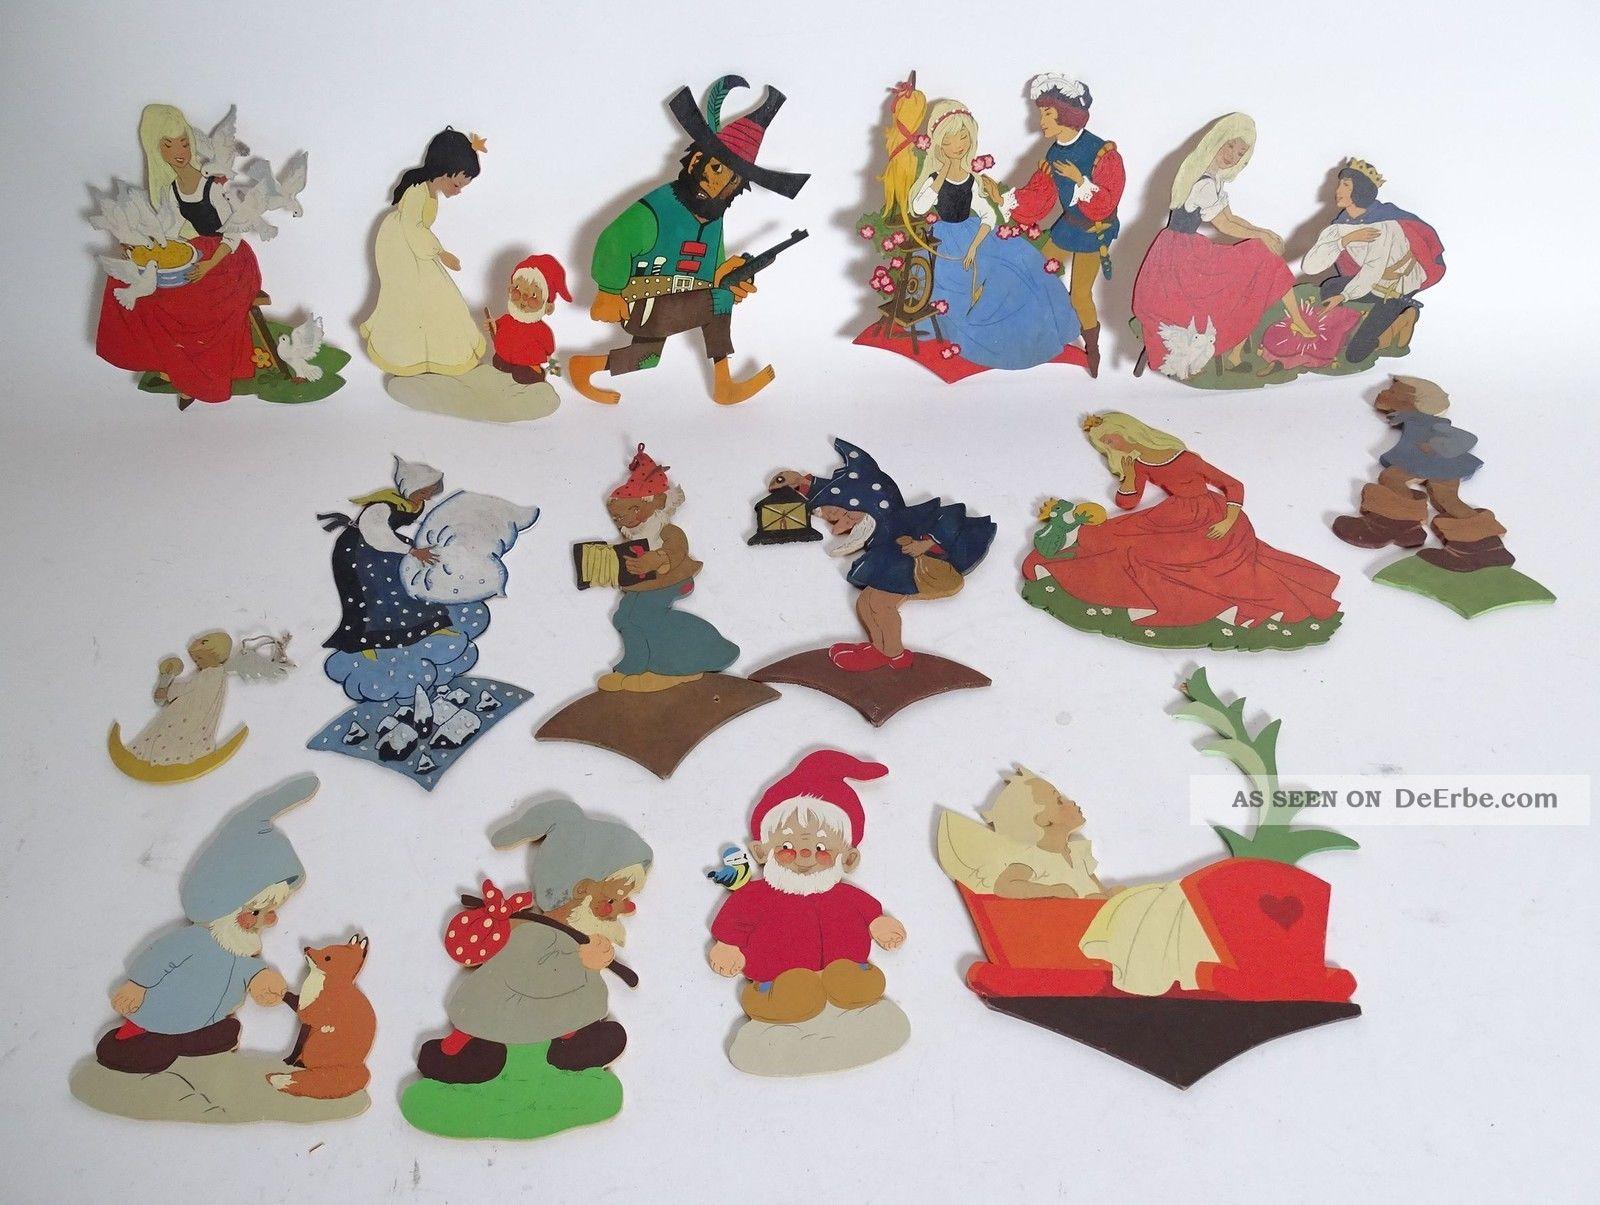 Riesiges Konvolut älterer Holzsägearbeiten Figuren Märchen Sandmännchen Zwerge Holzarbeiten Bild